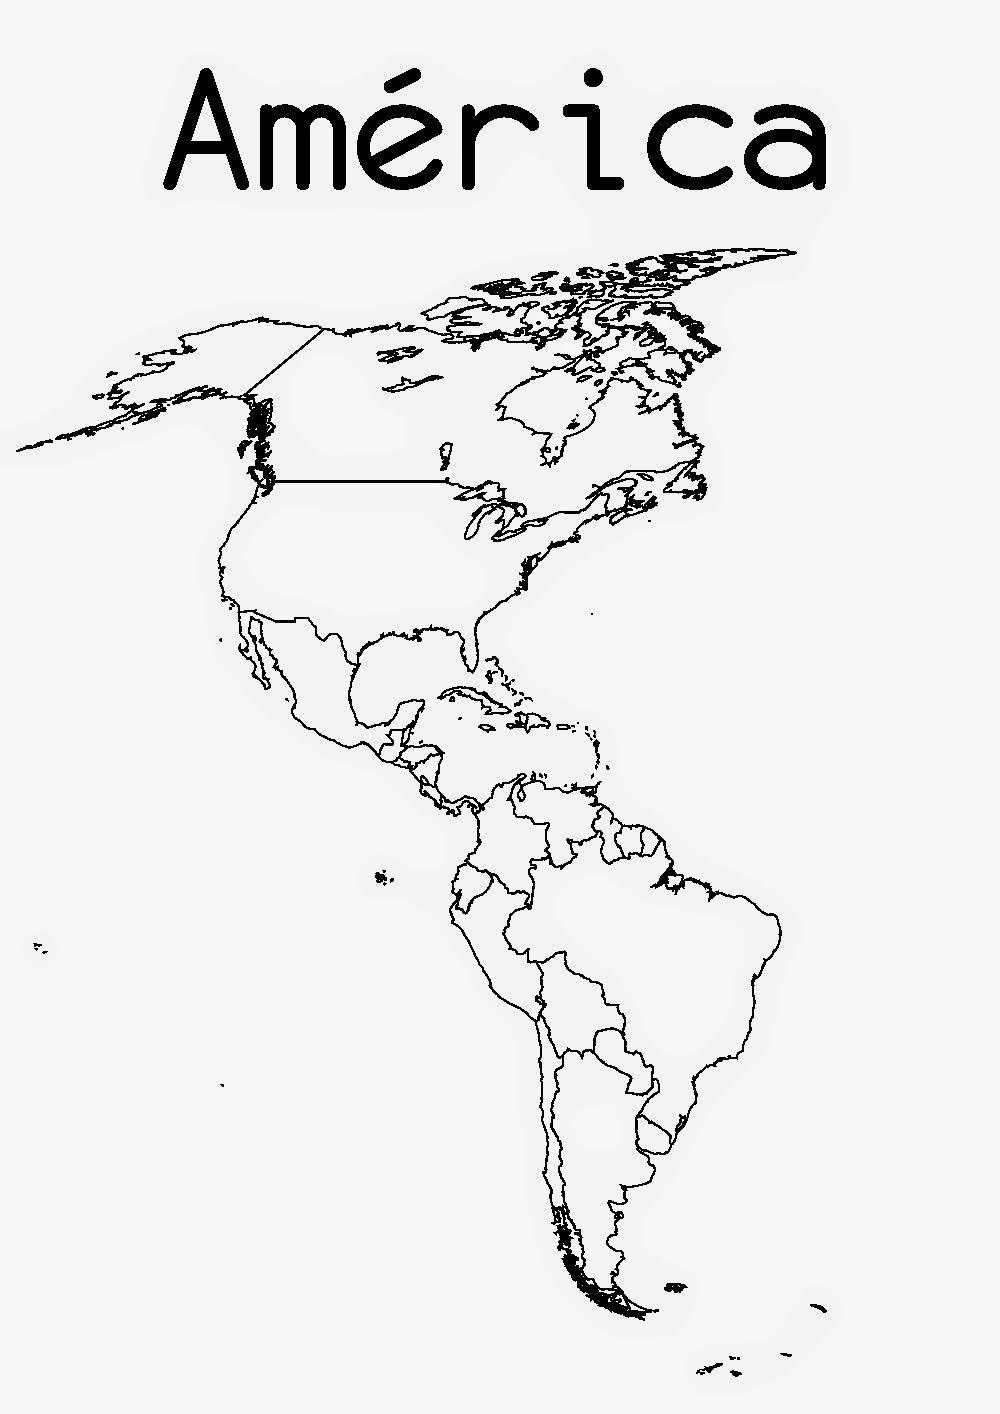 mapa mudo mapa mudo de america para imprimir | Stamping | Pinterest mapa mudo